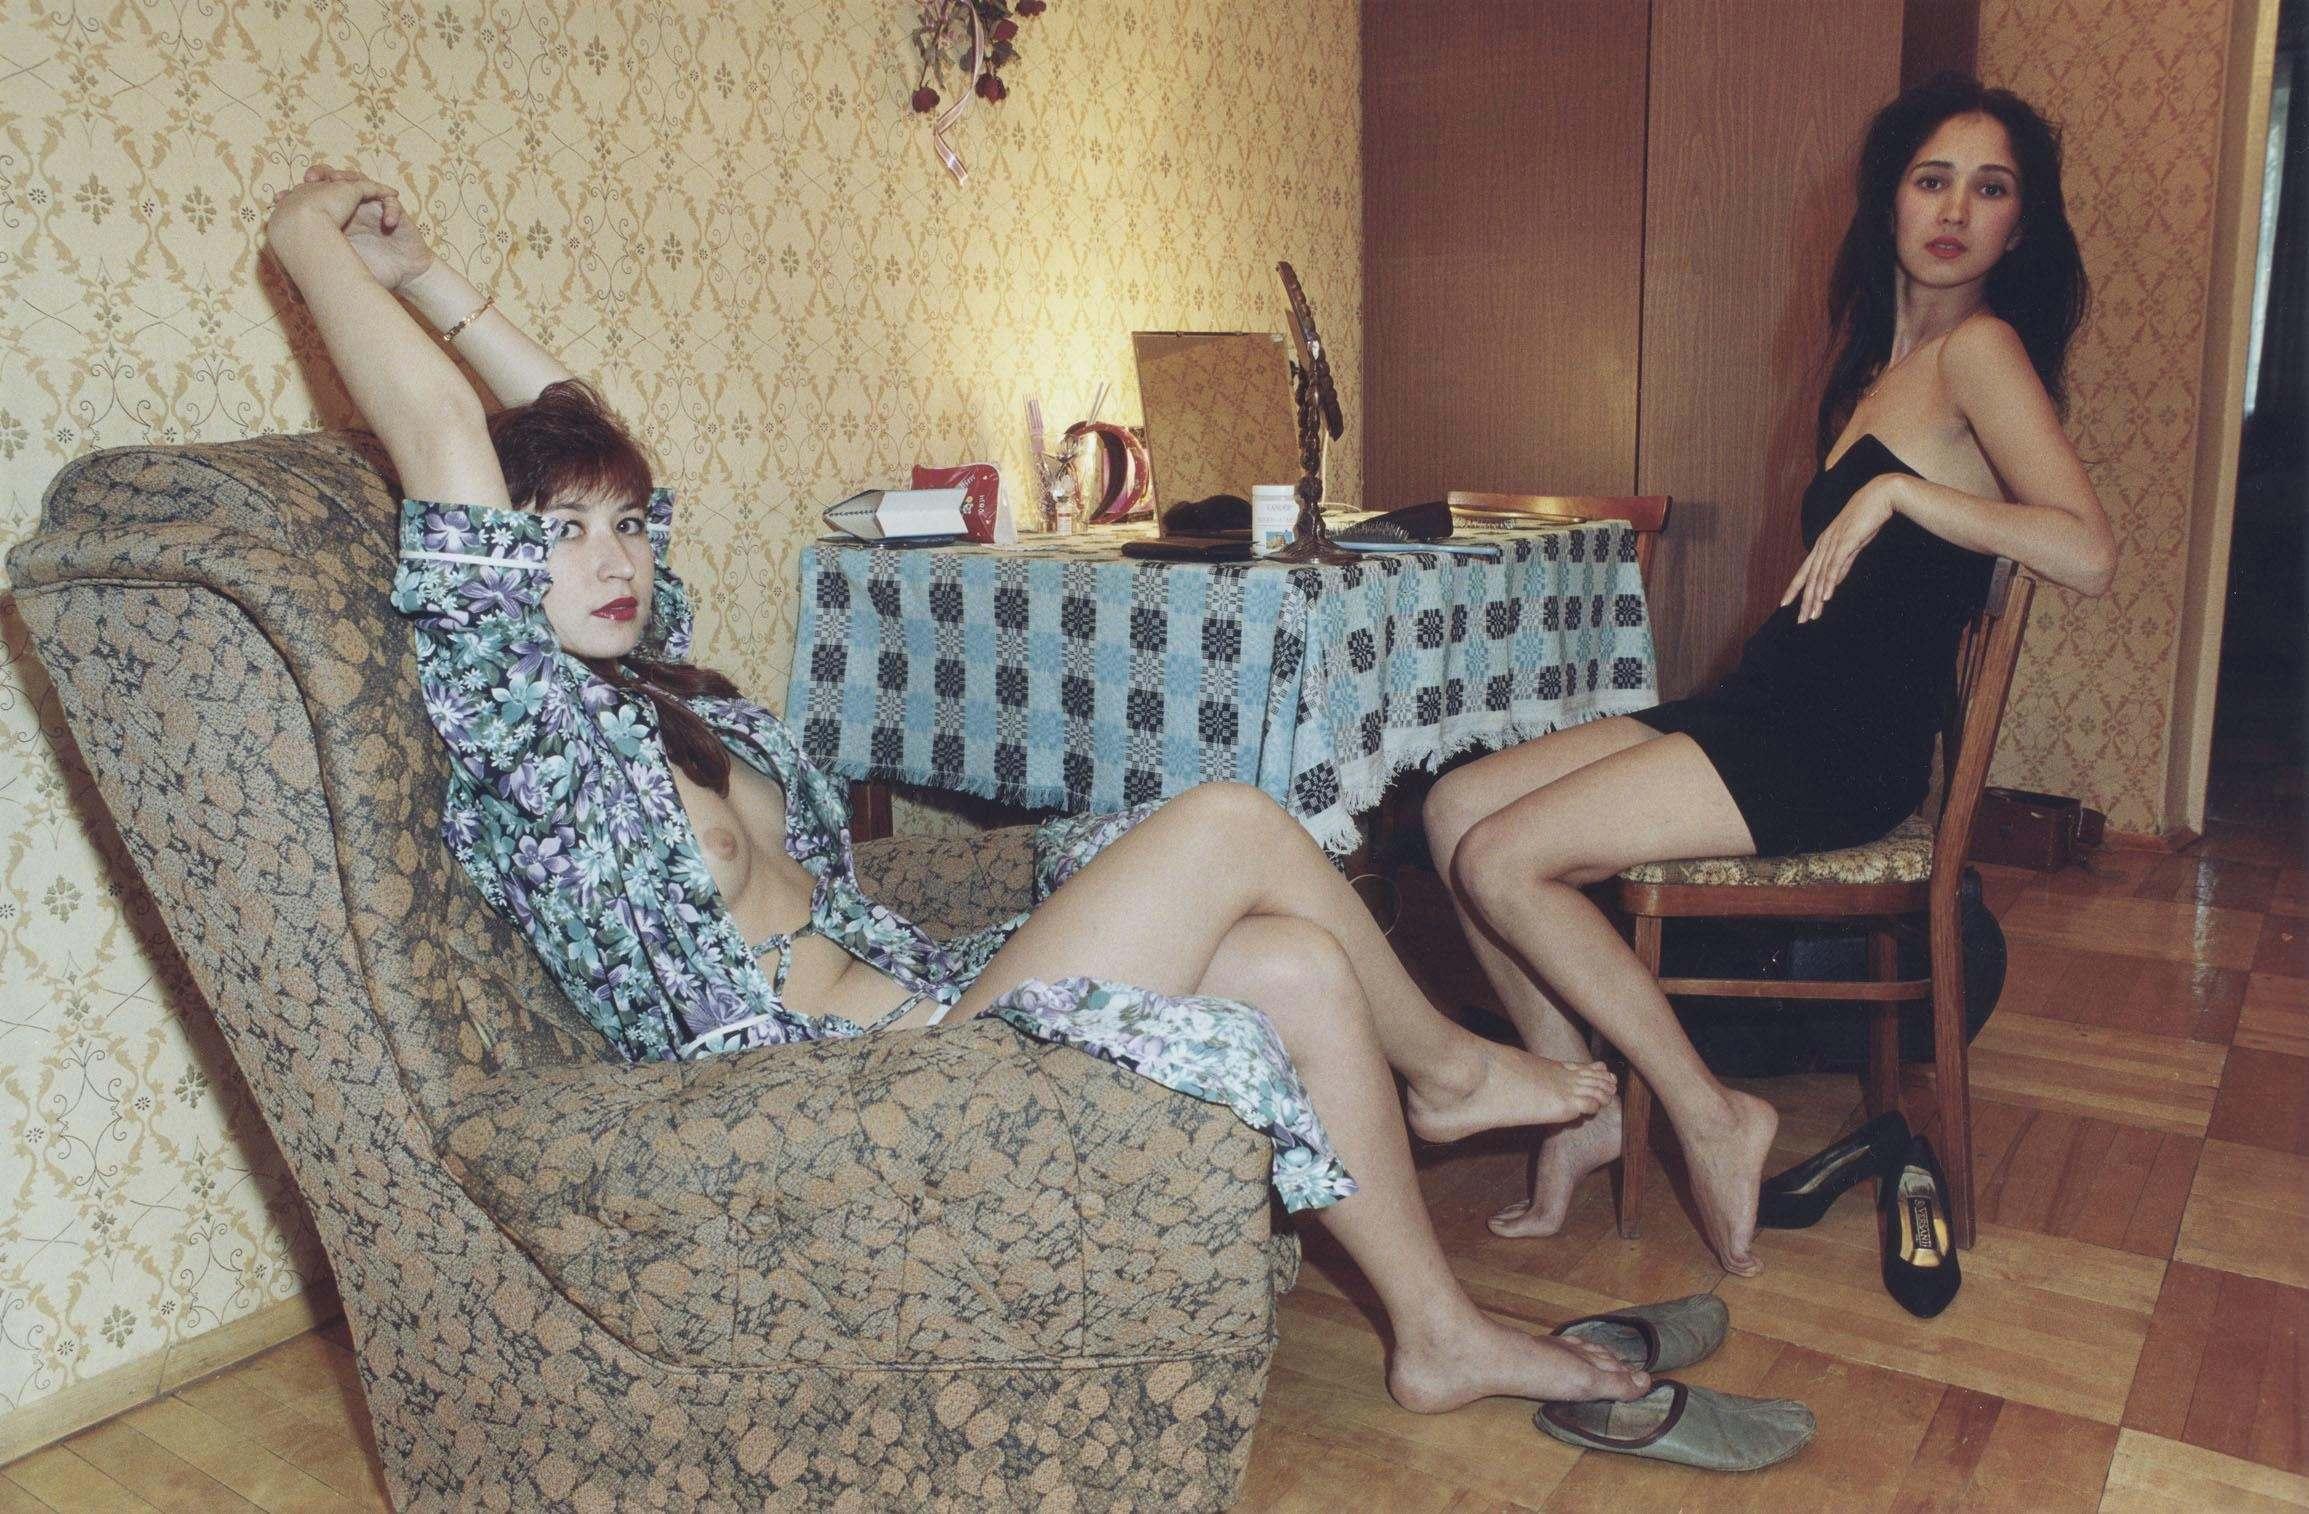 Фото секс русское домашнее, Домашнее порно фото - частное секс фото 20 фотография